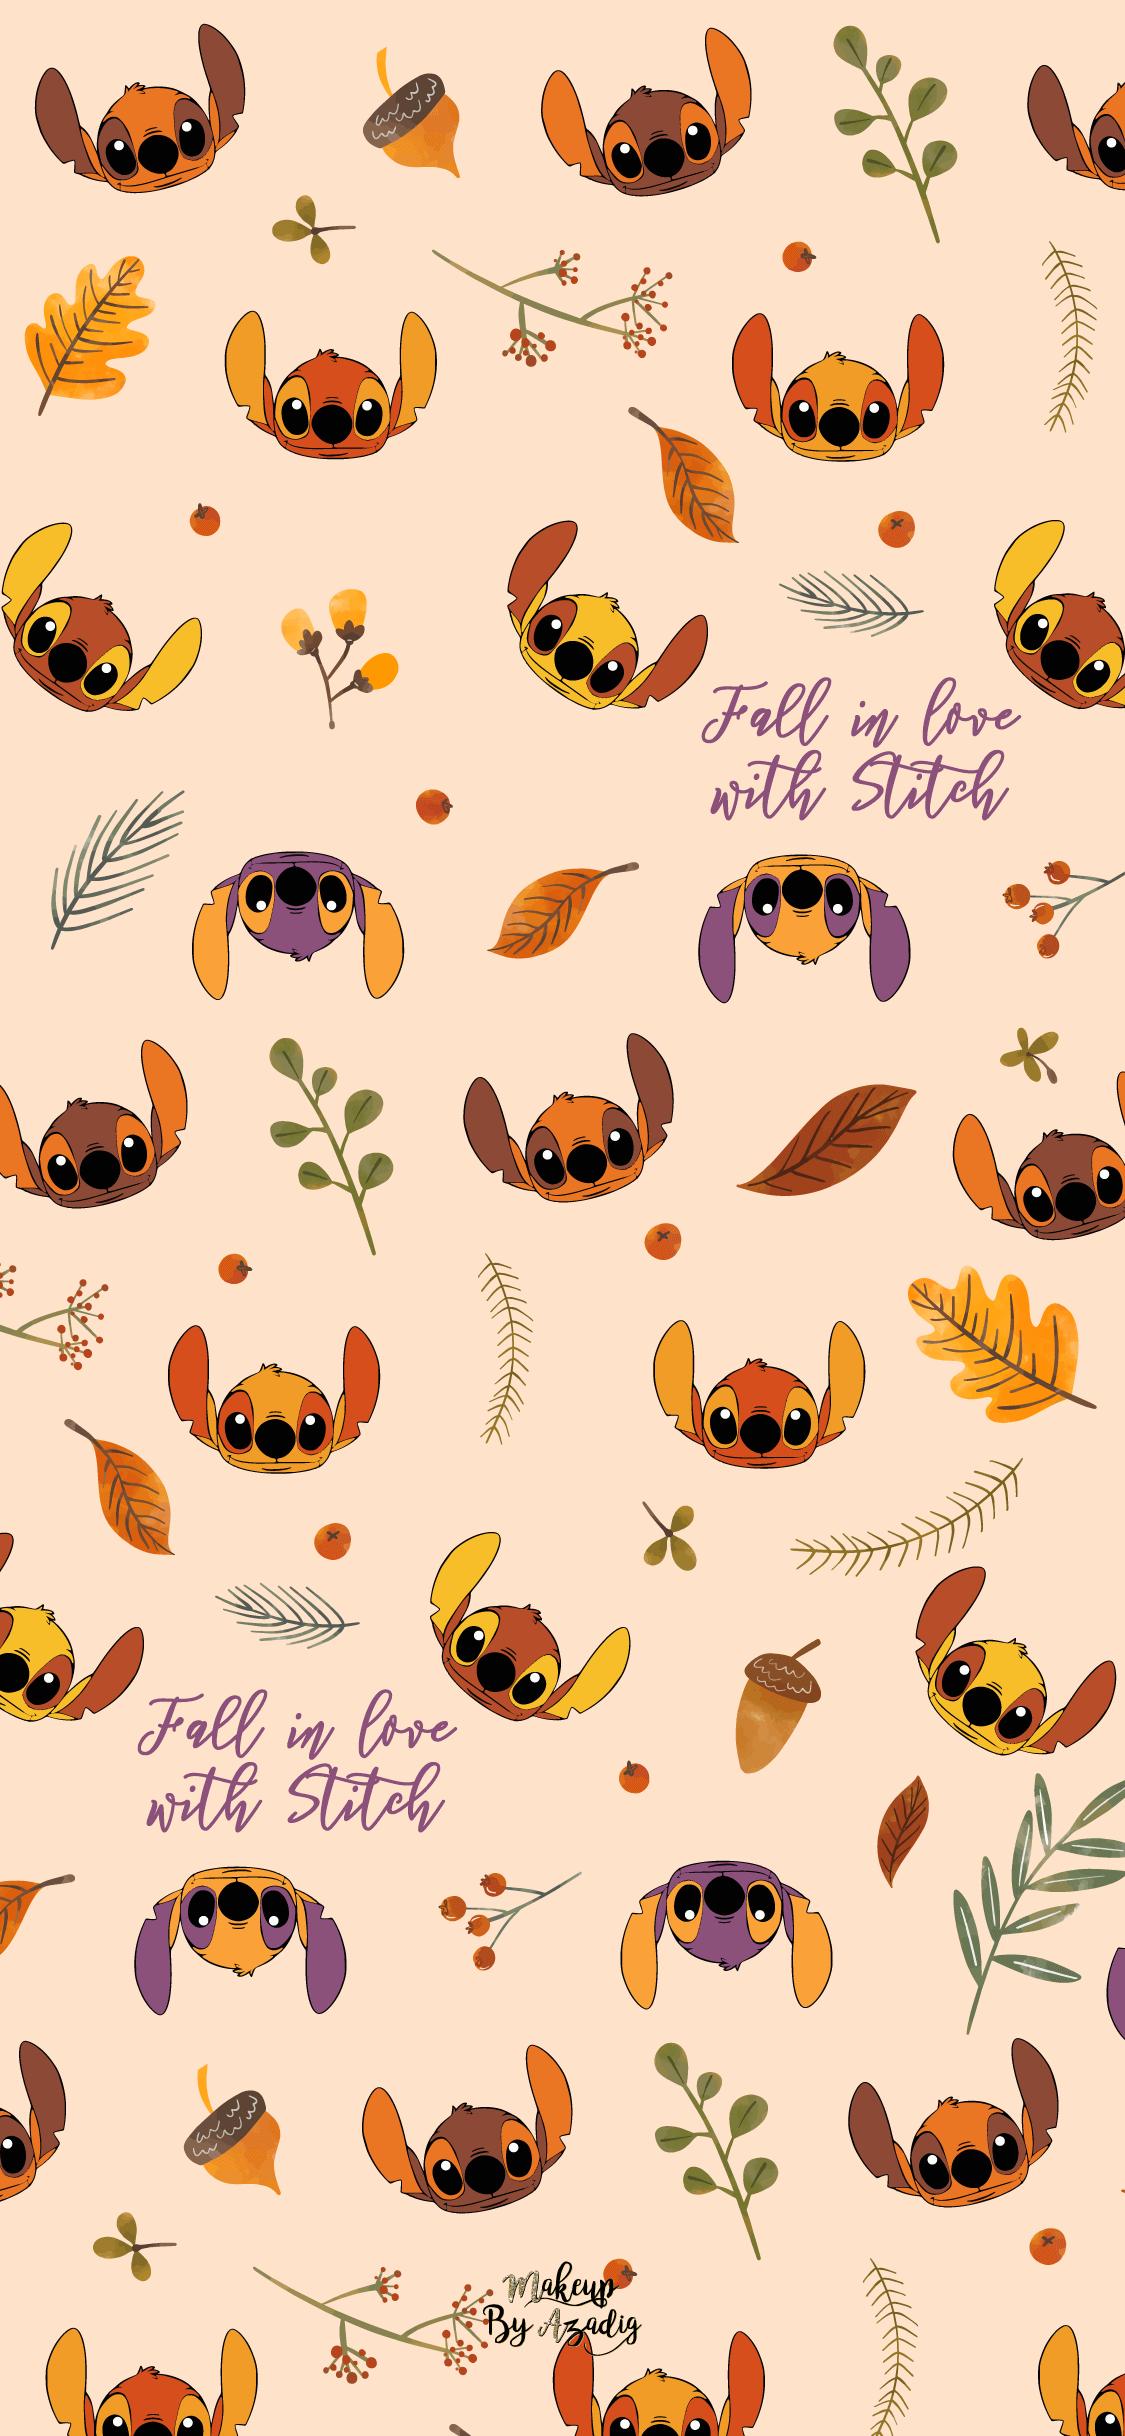 Fond Decran Wallpaper Stitch Autumn Automne Fallinlove Disney Fall Wallpaper Iphone 1125x2436 Wallpaper Teahub Io